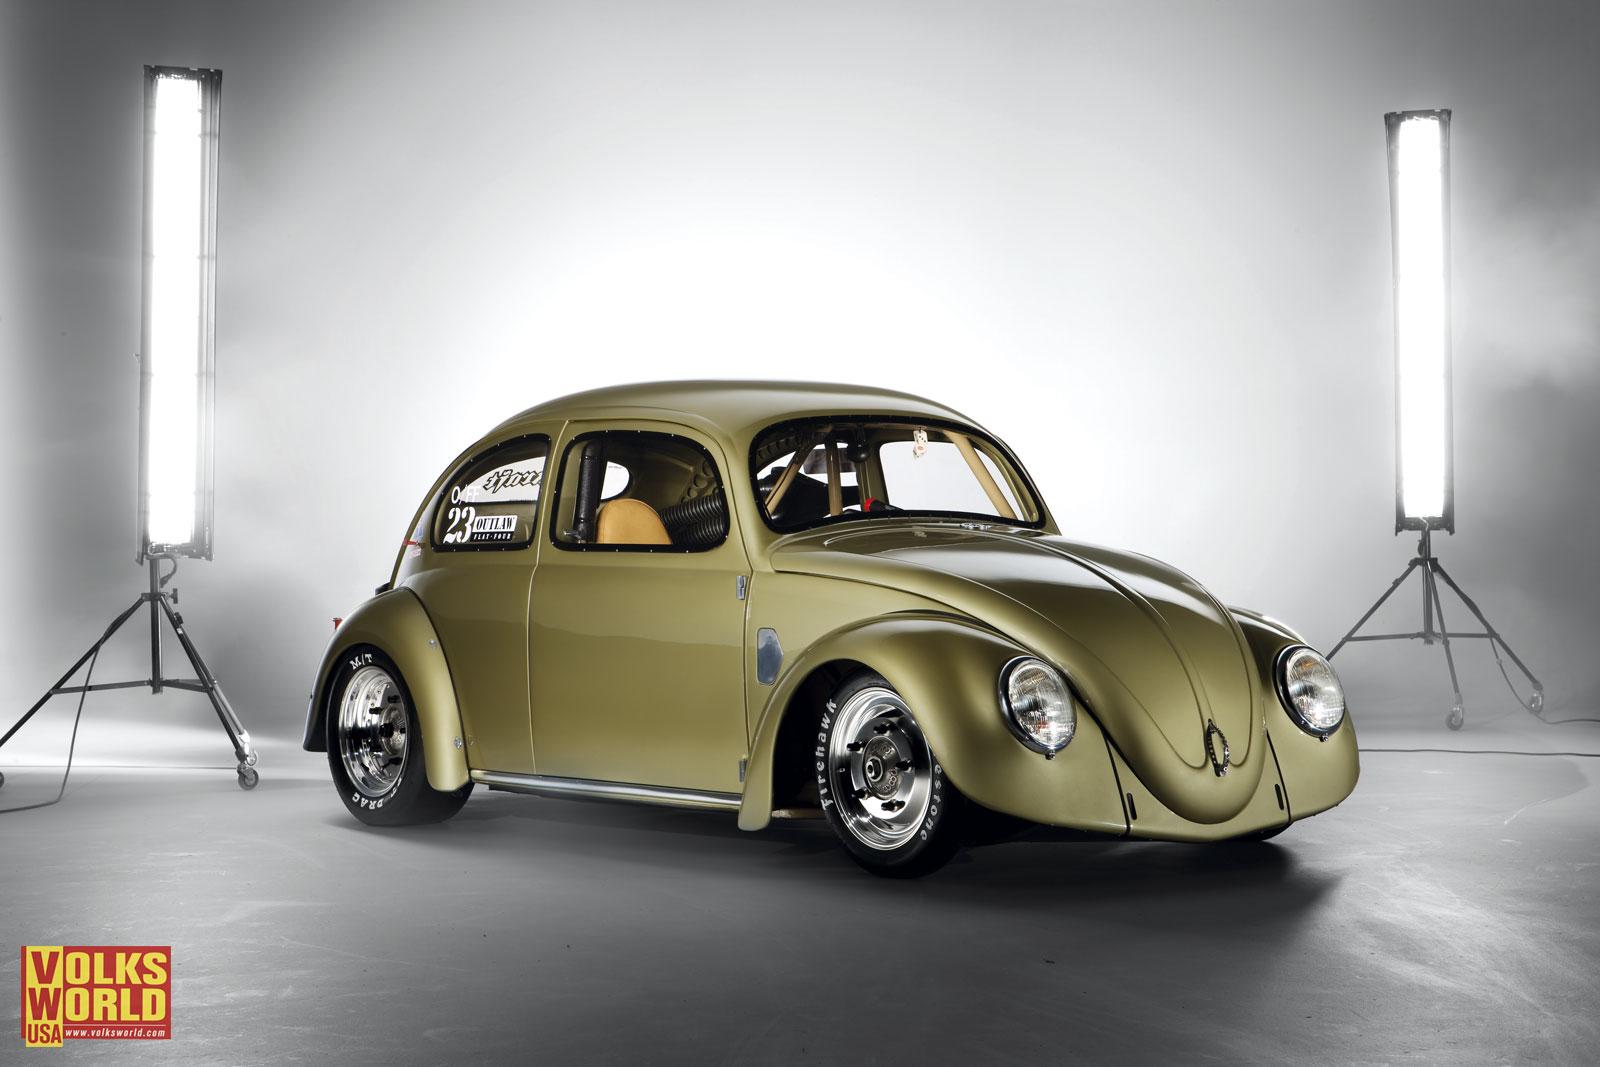 Classic Beetle Wallpaper 1600x1067